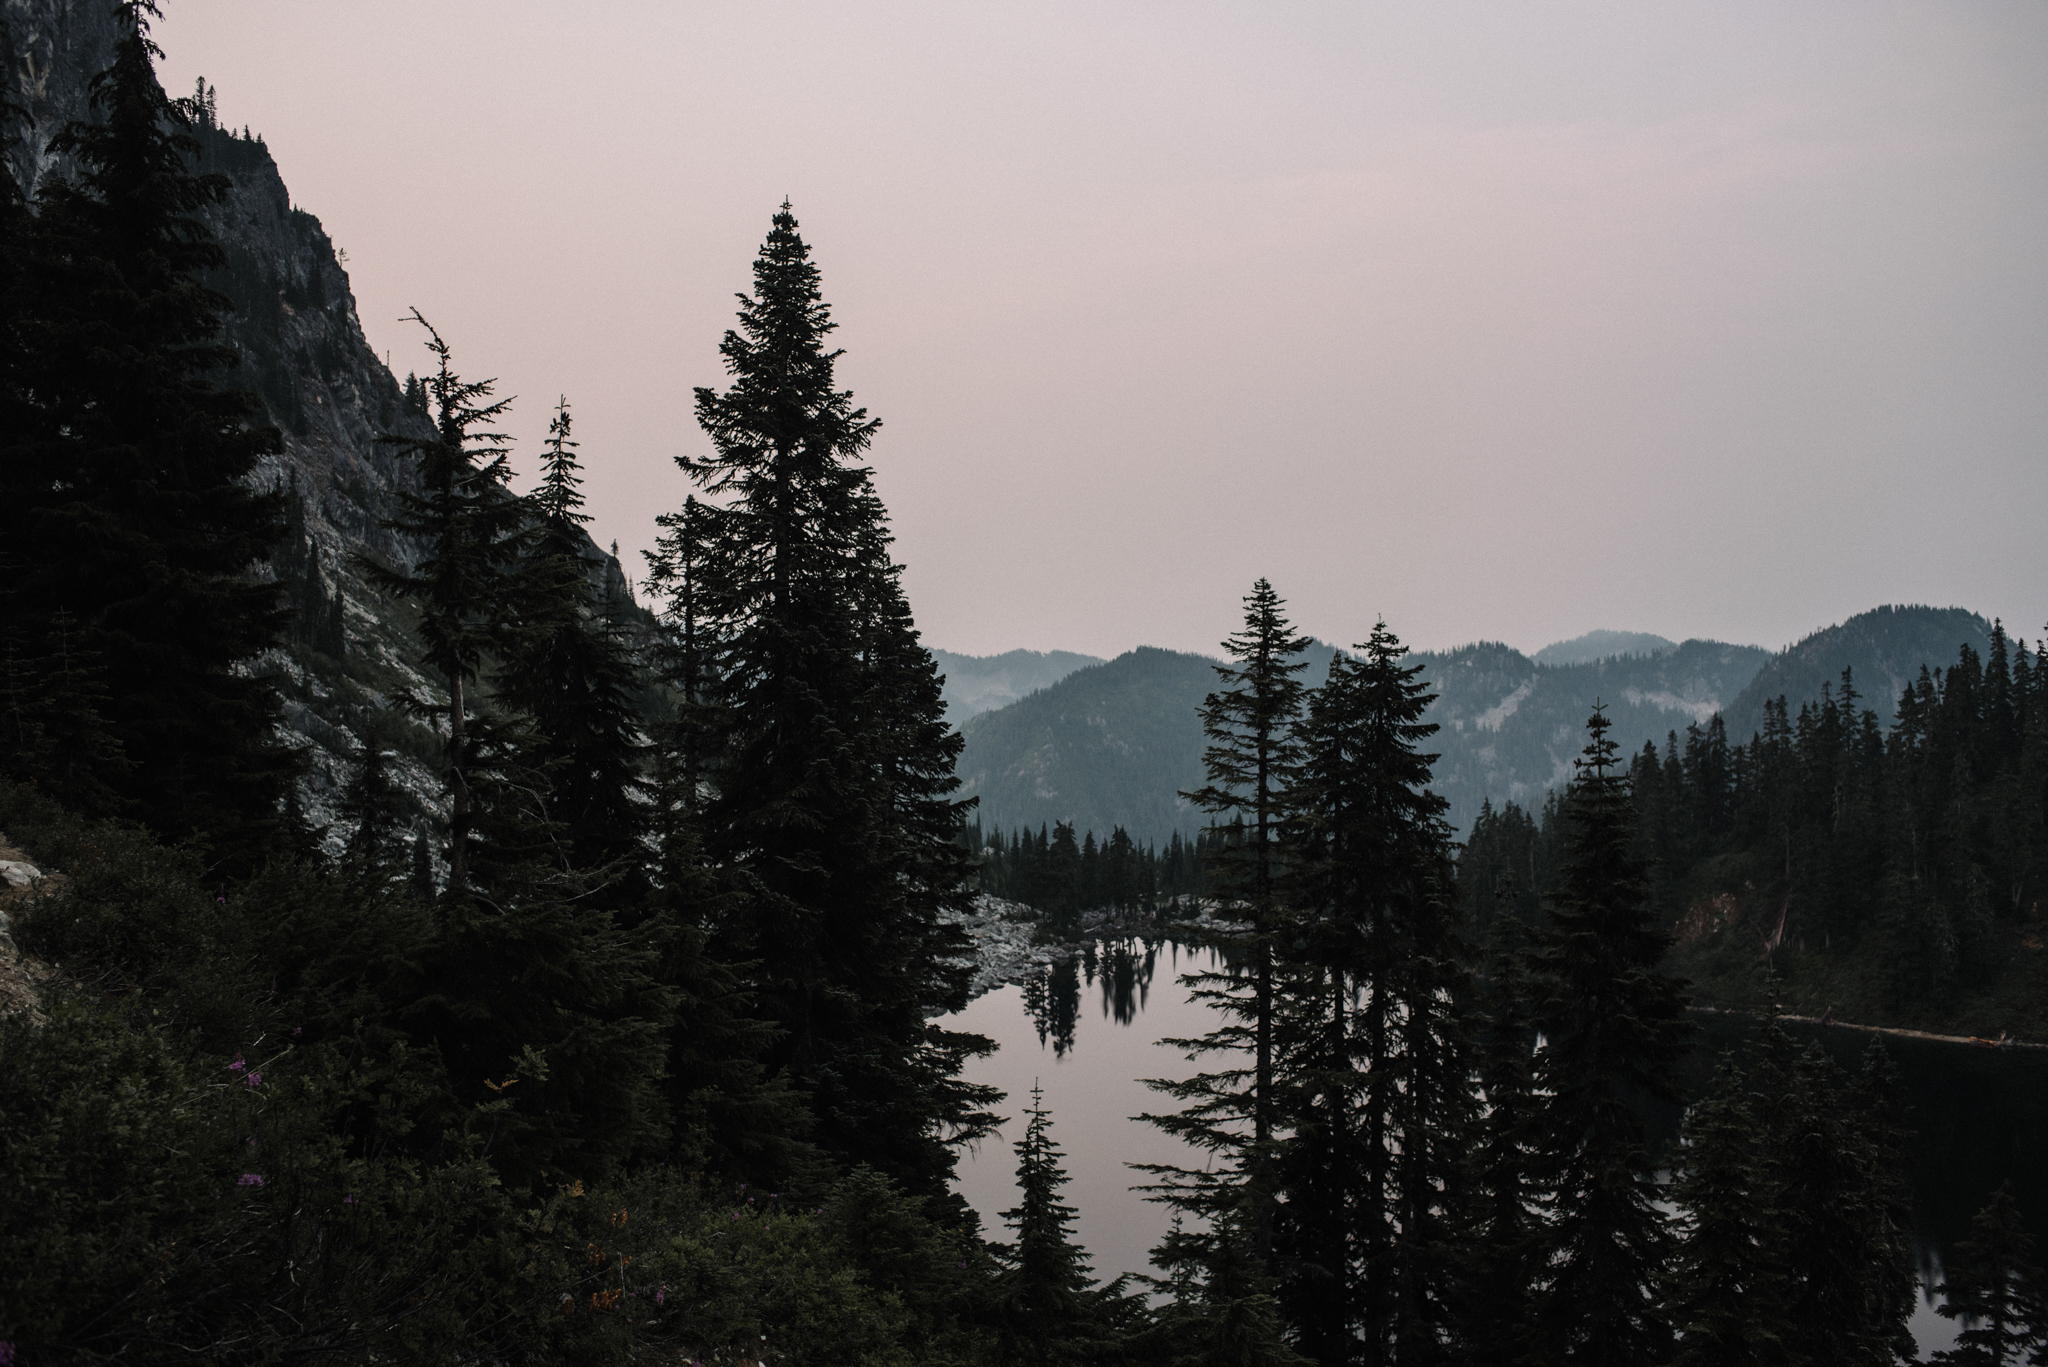 Megan and Andrew Lake Valhalla Washington PNW Adventure Elopement White Sails Creative Sunrise Hike_42.JPG